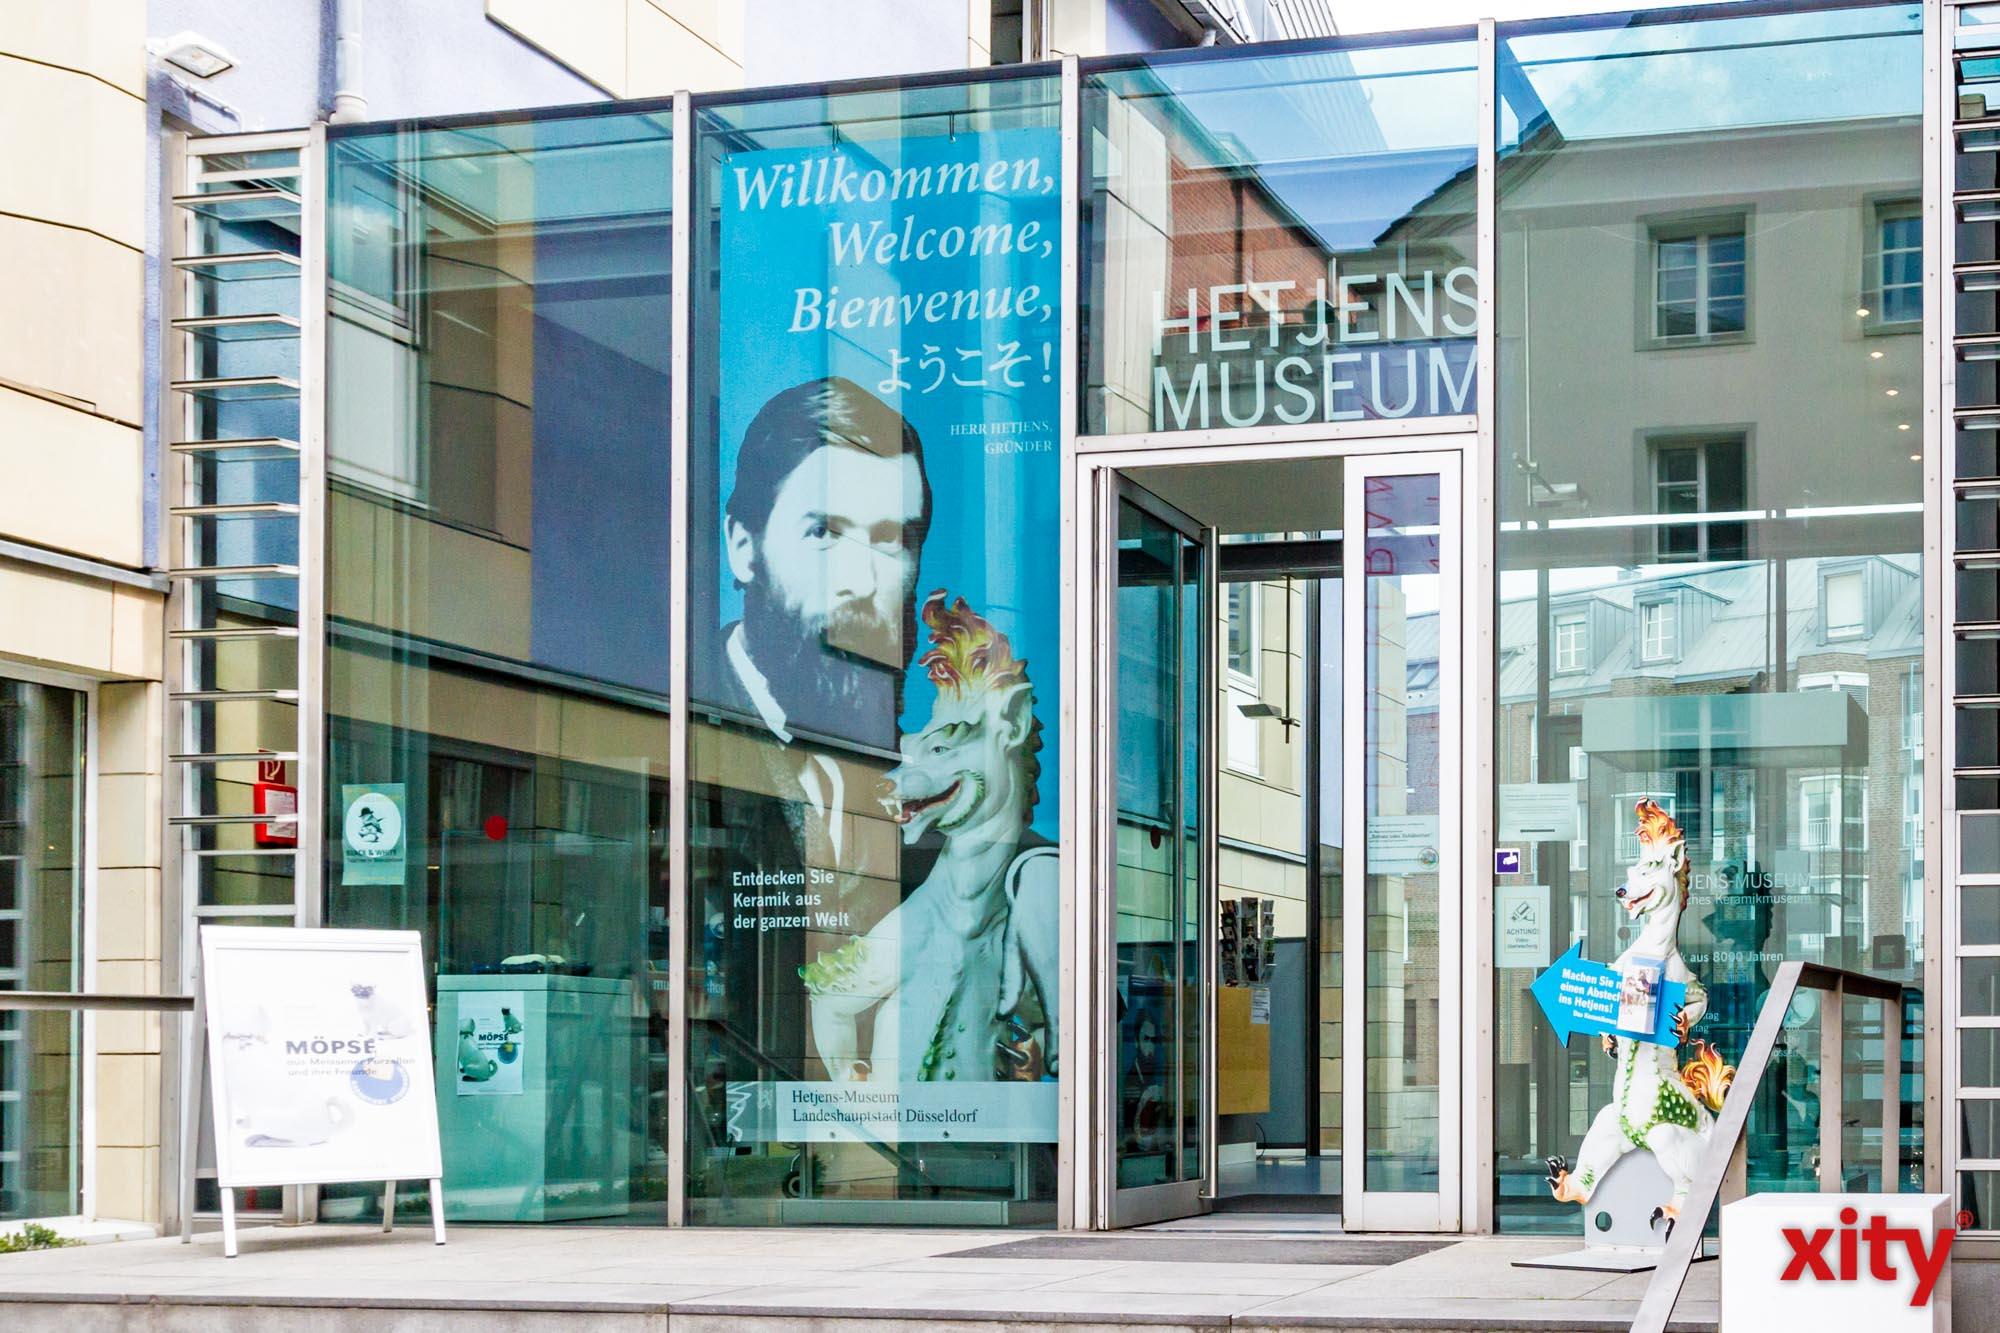 Familiensonntag im Hetjens-Museum Düsseldorf (Foto: xity)